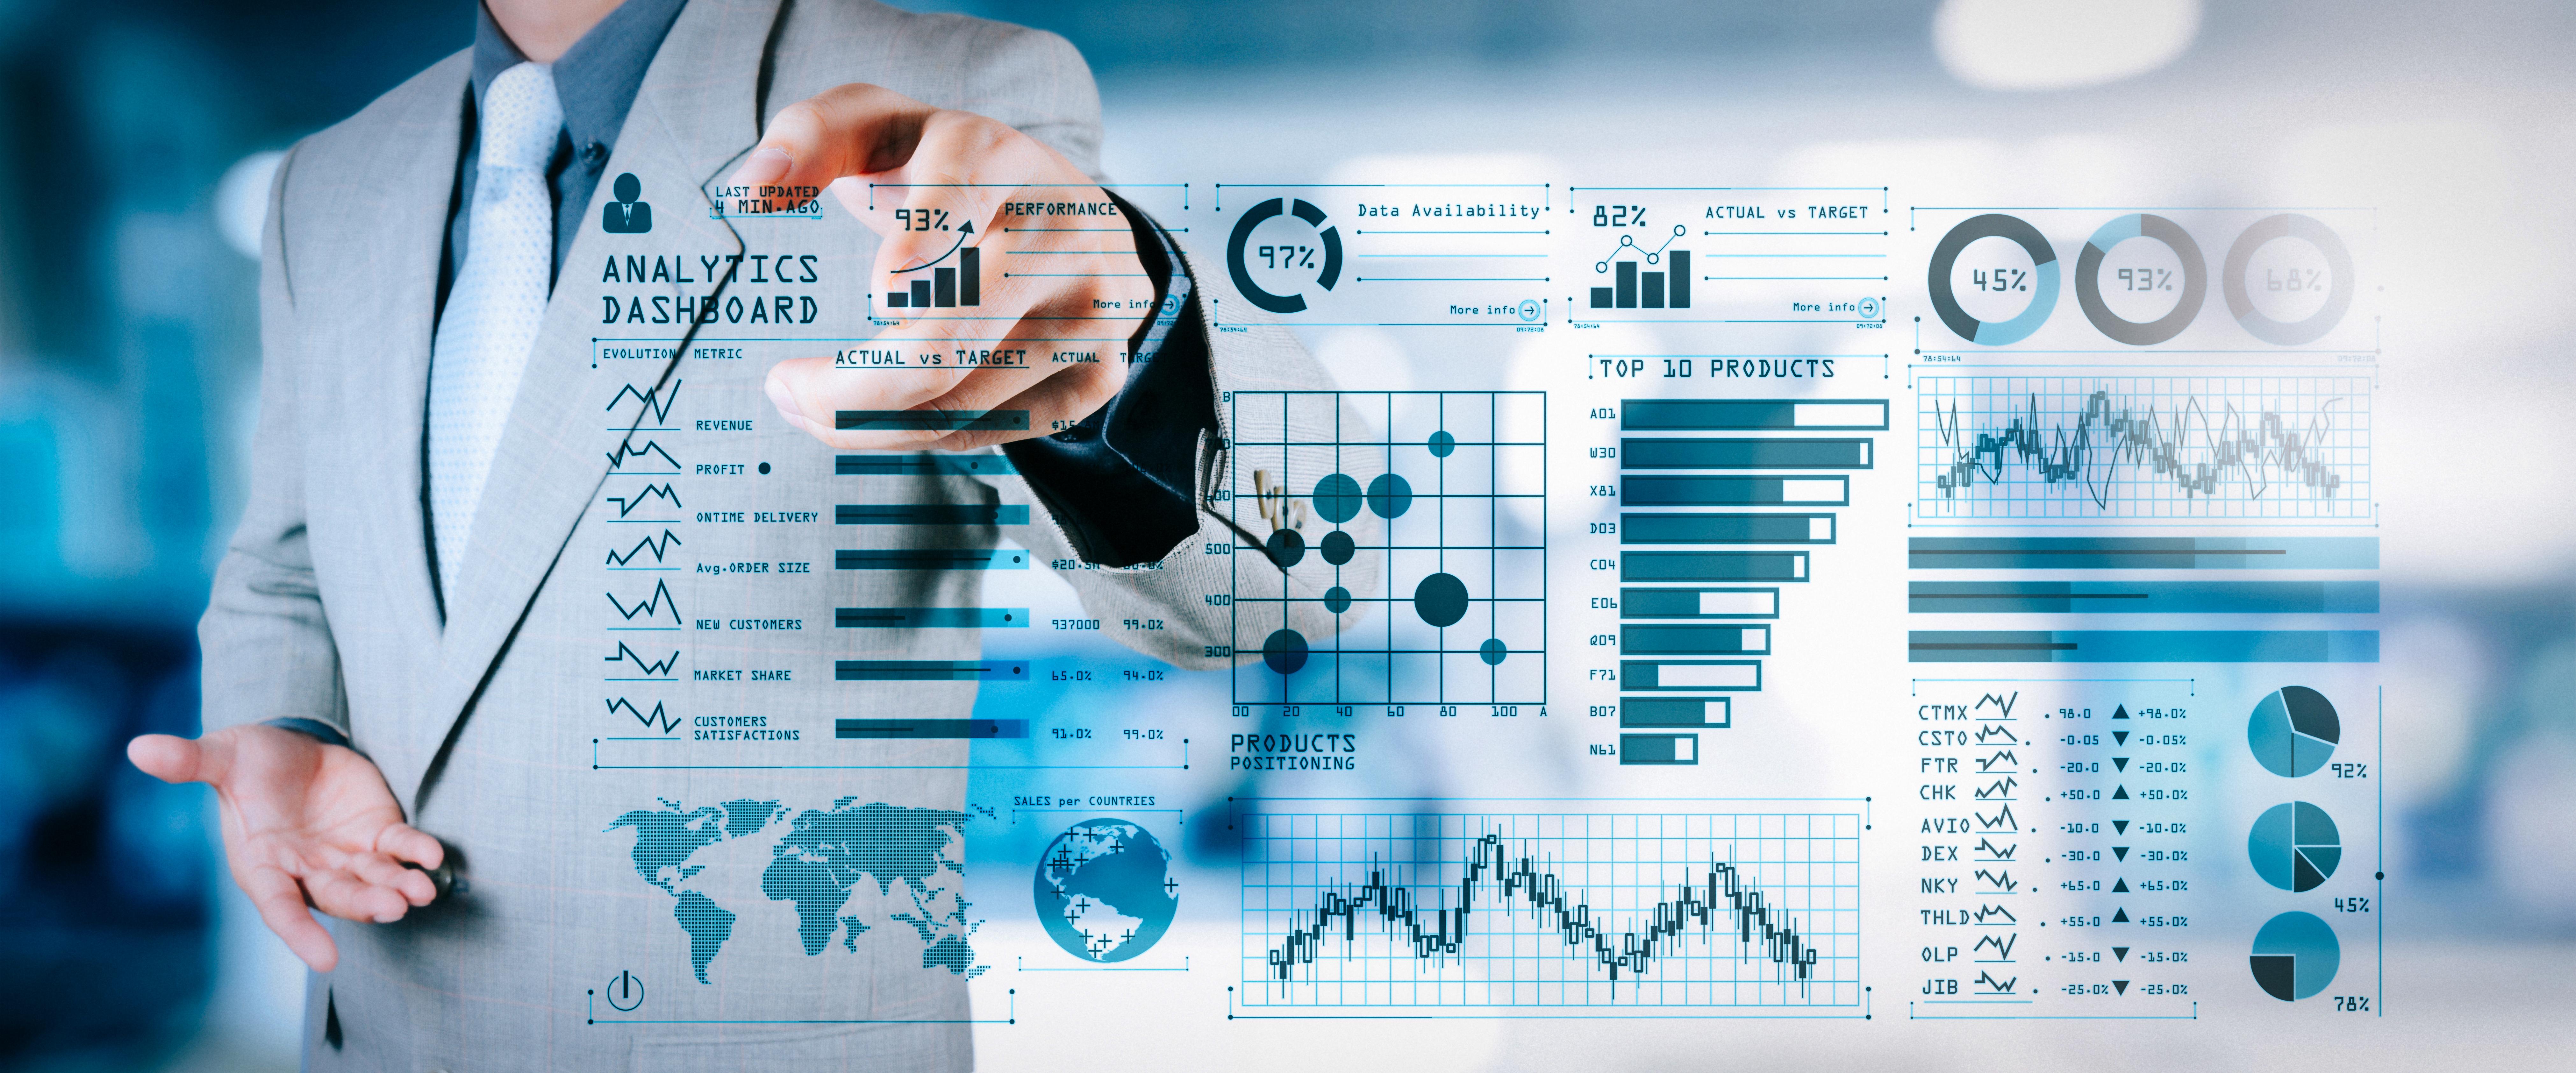 Intelligence business analytics